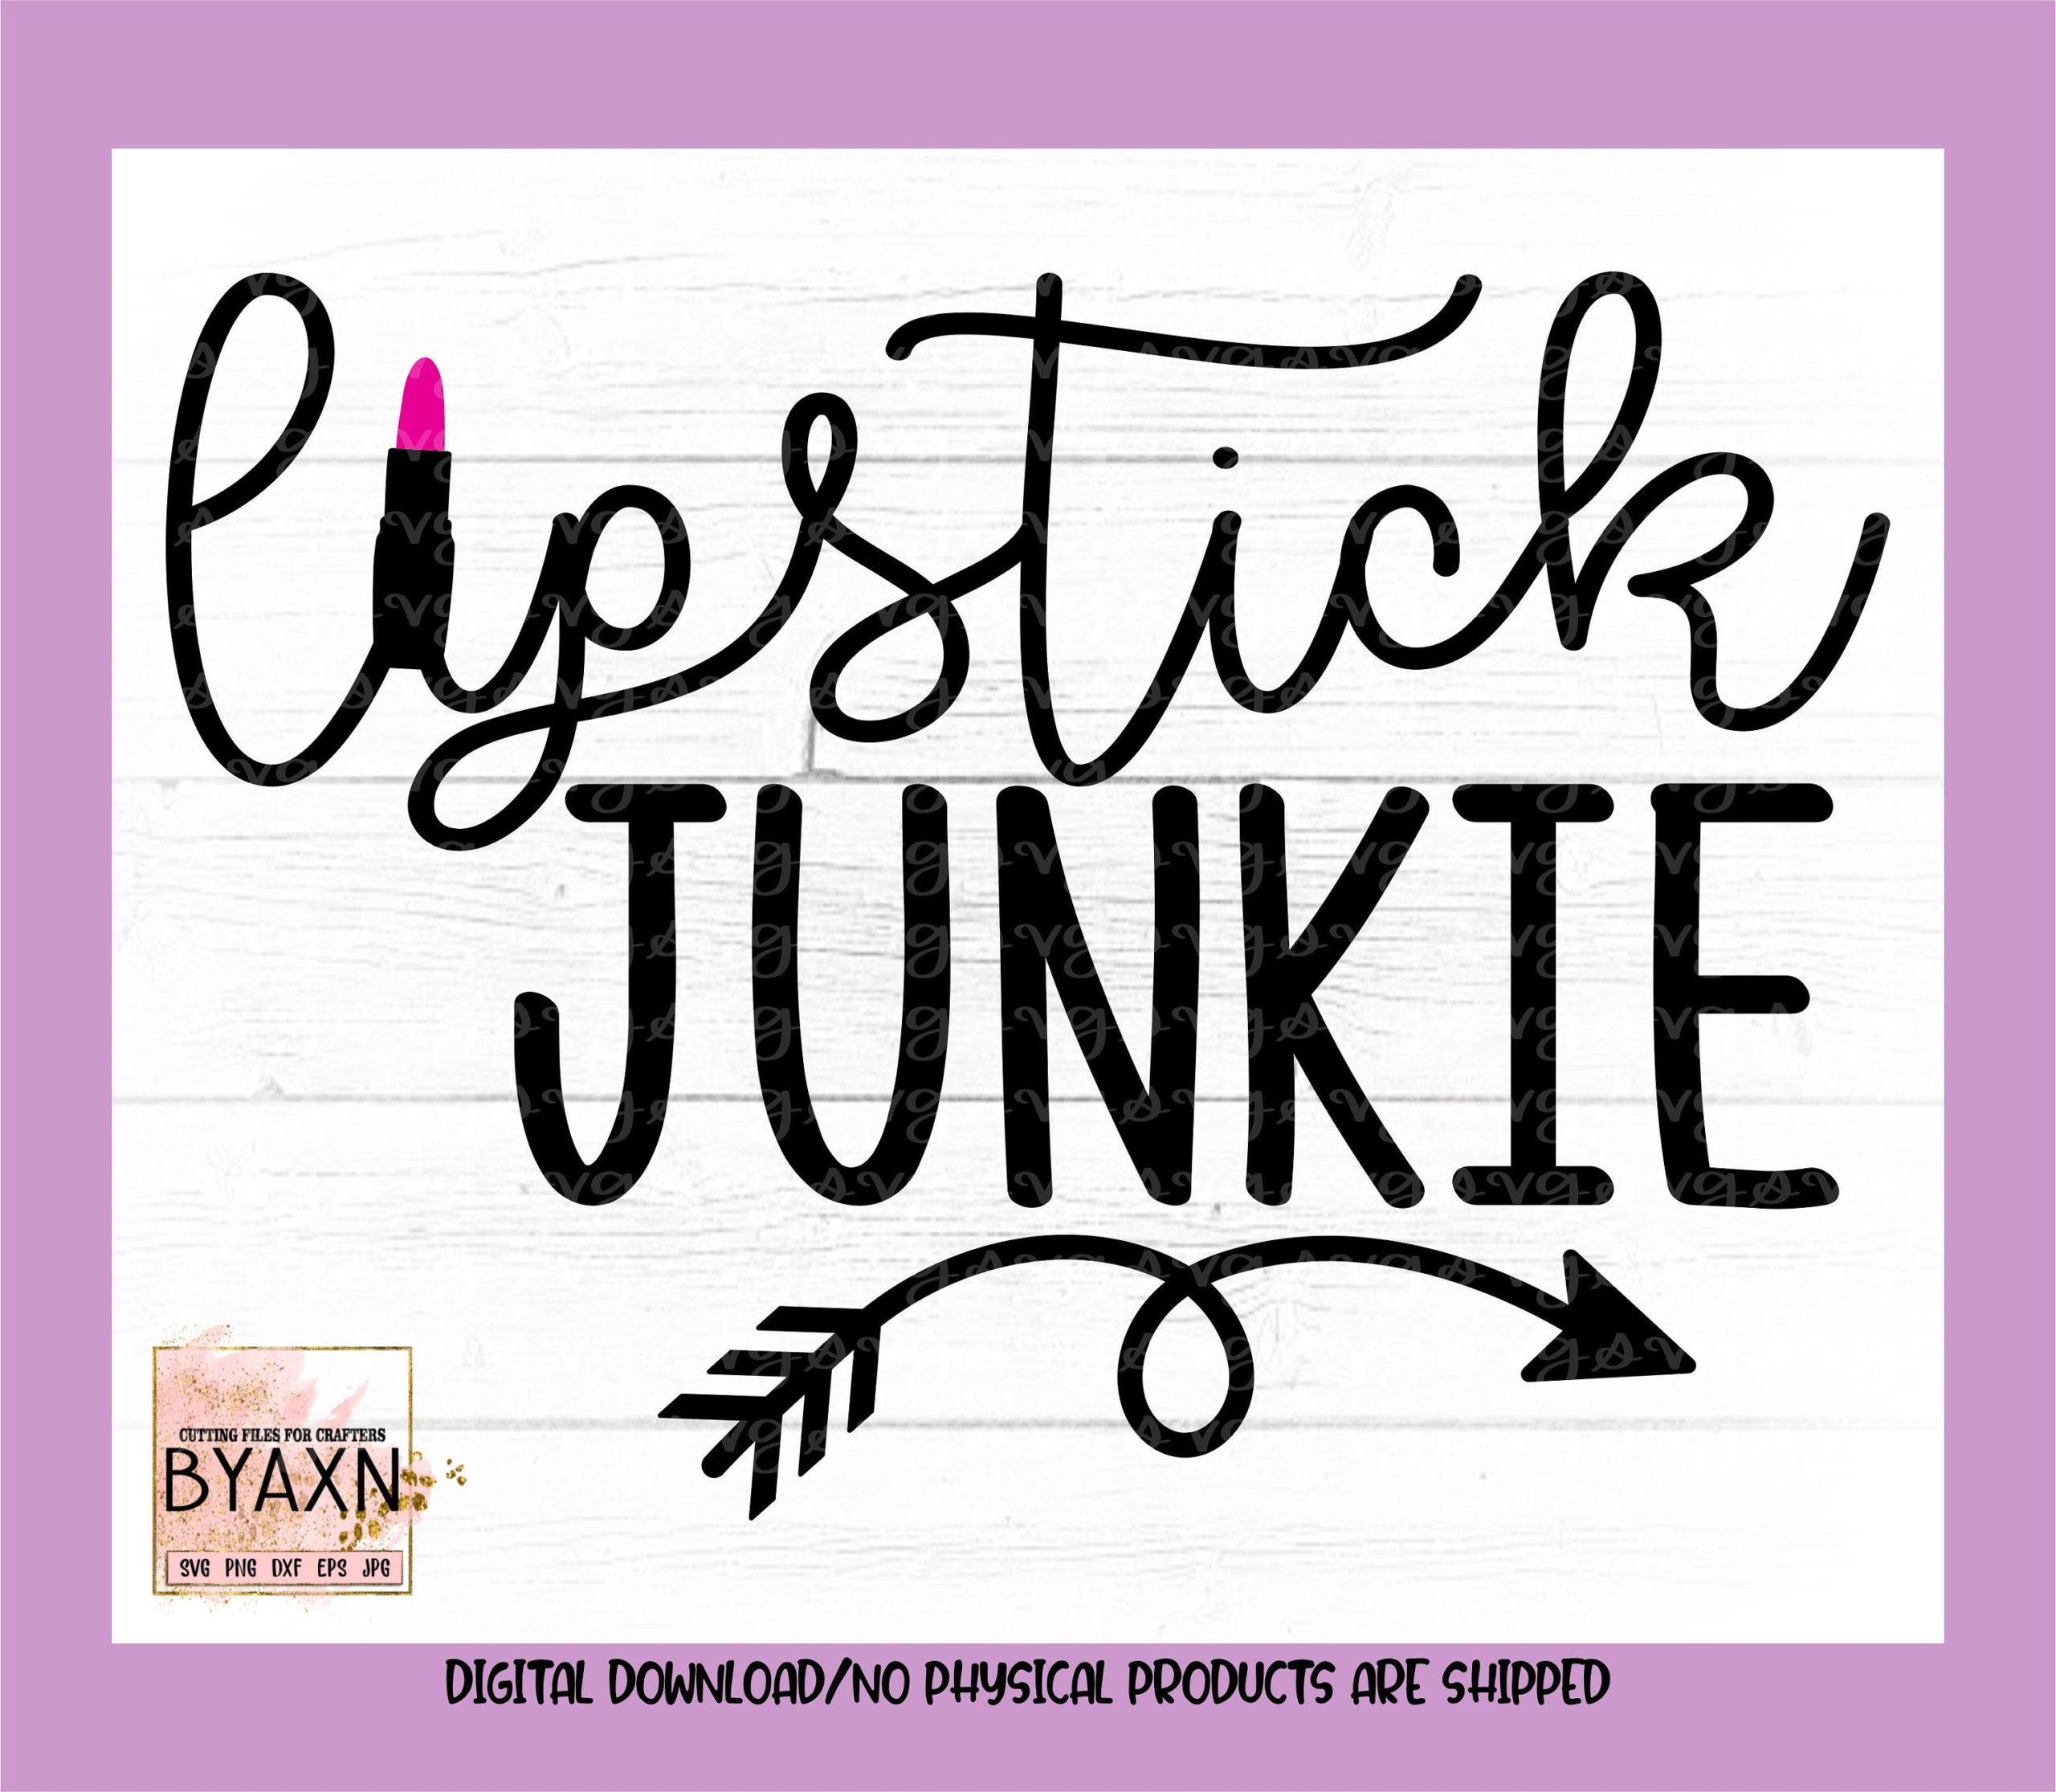 Makeup-svg-lipstick-junkie-svg-makeup-lipstick-addict-svg-makeup-lover-svg-mascara-svg-makeup-svg-design-makeup-cut-file-cricut-svg-60514cdc